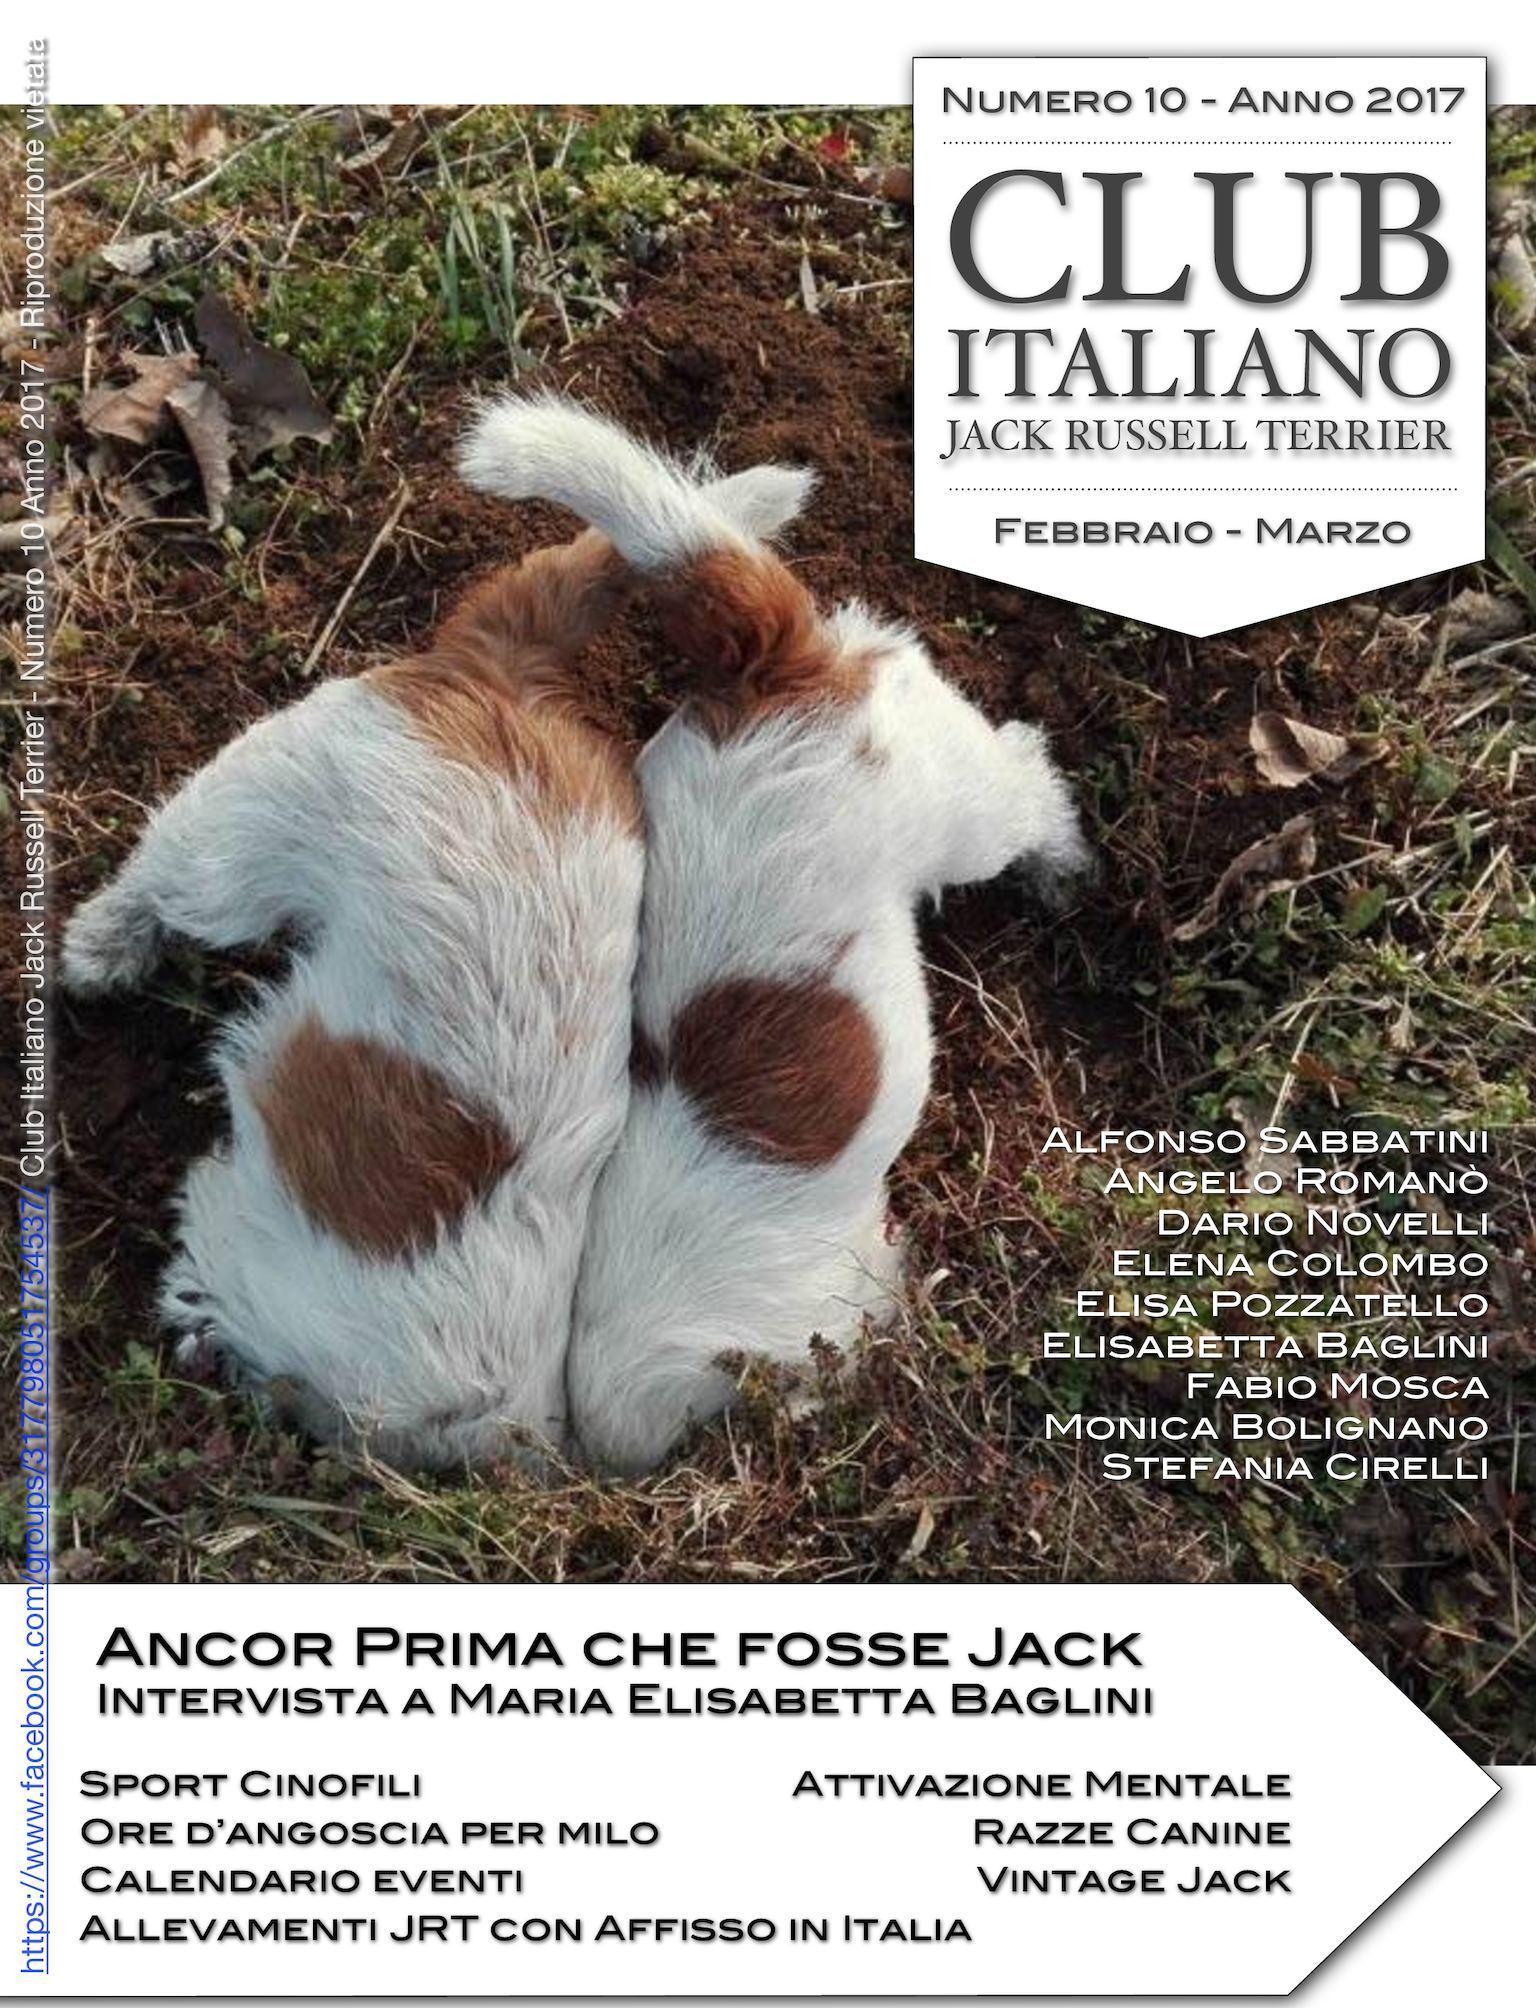 Expocani Calendario.Calameo Club Italiano Jack Russell Terrier N 10 2017